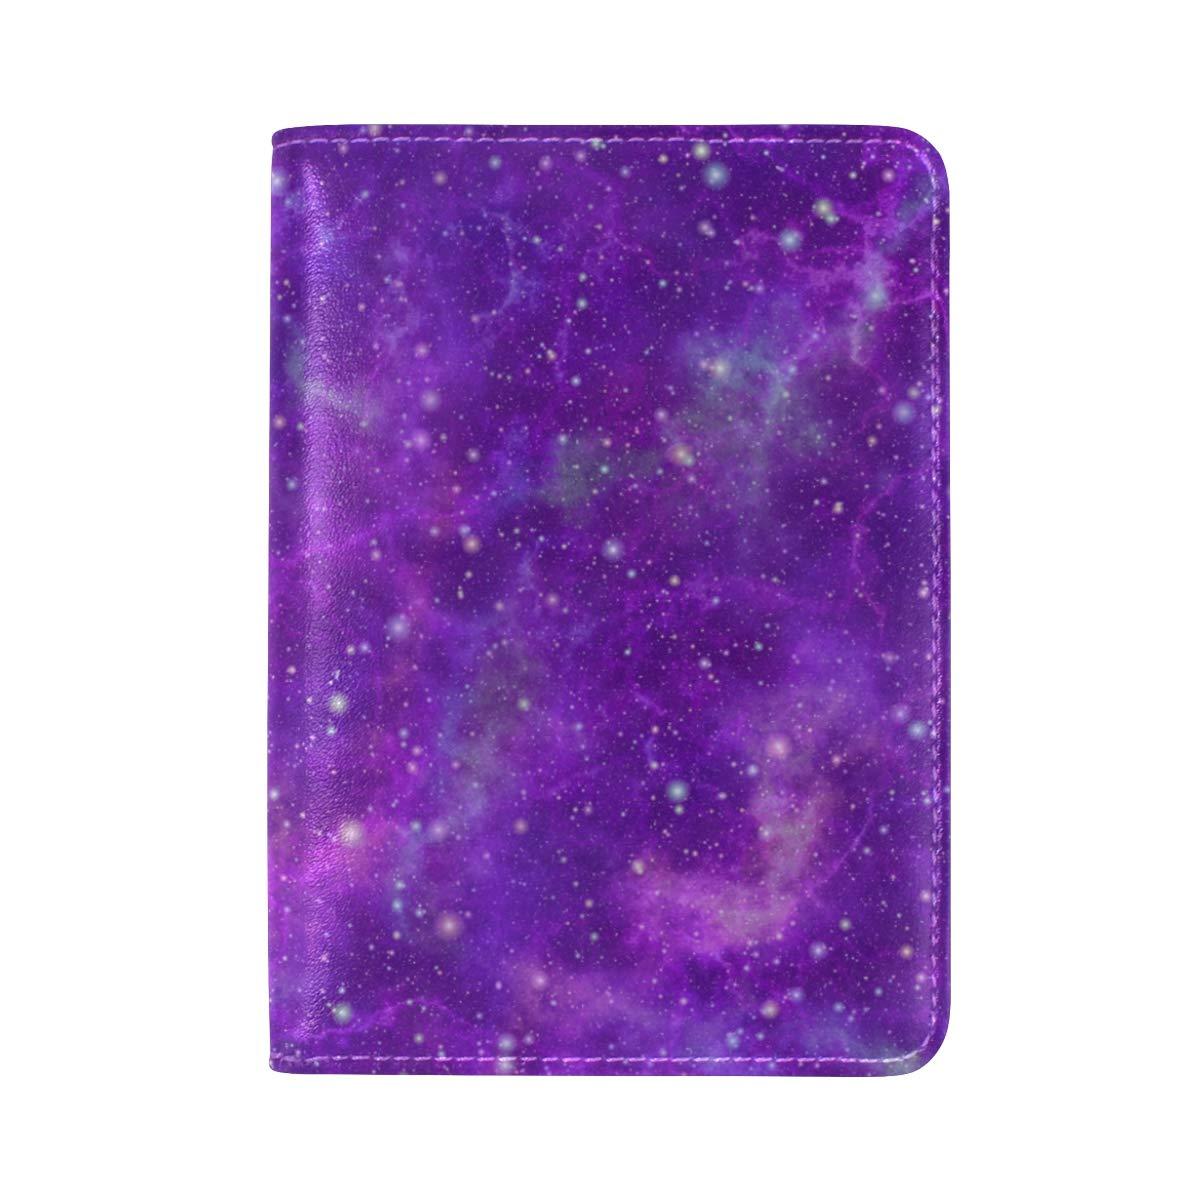 Purple Nebula Starry Sky Night One Pocket Leather Passport Holder Cover Case Protector for Men Women Travel